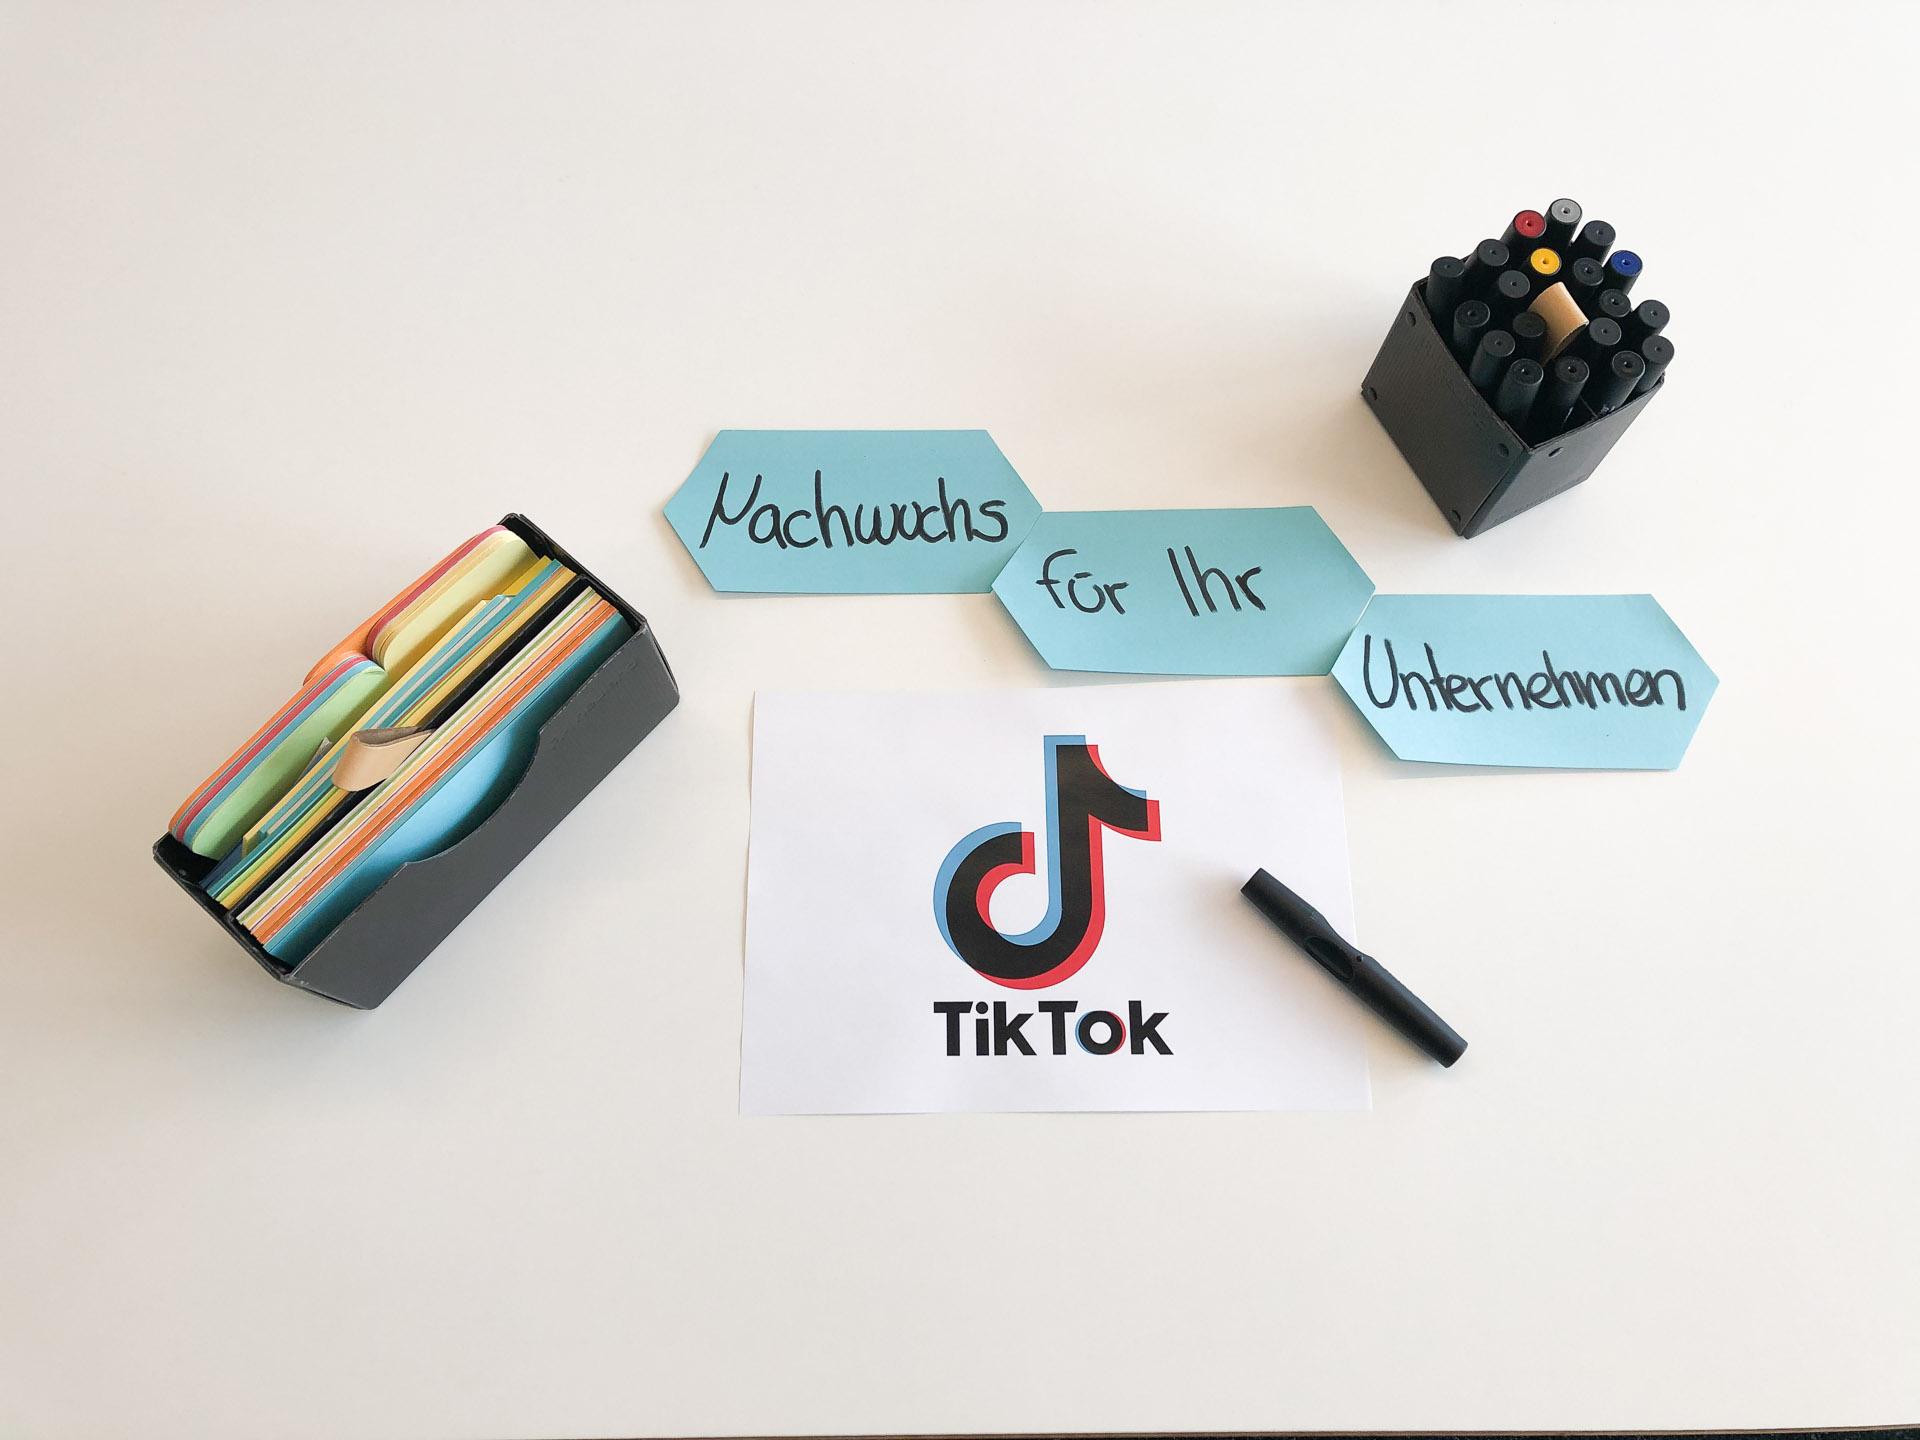 Tiktok - Plattform für Nachwuchskräfte